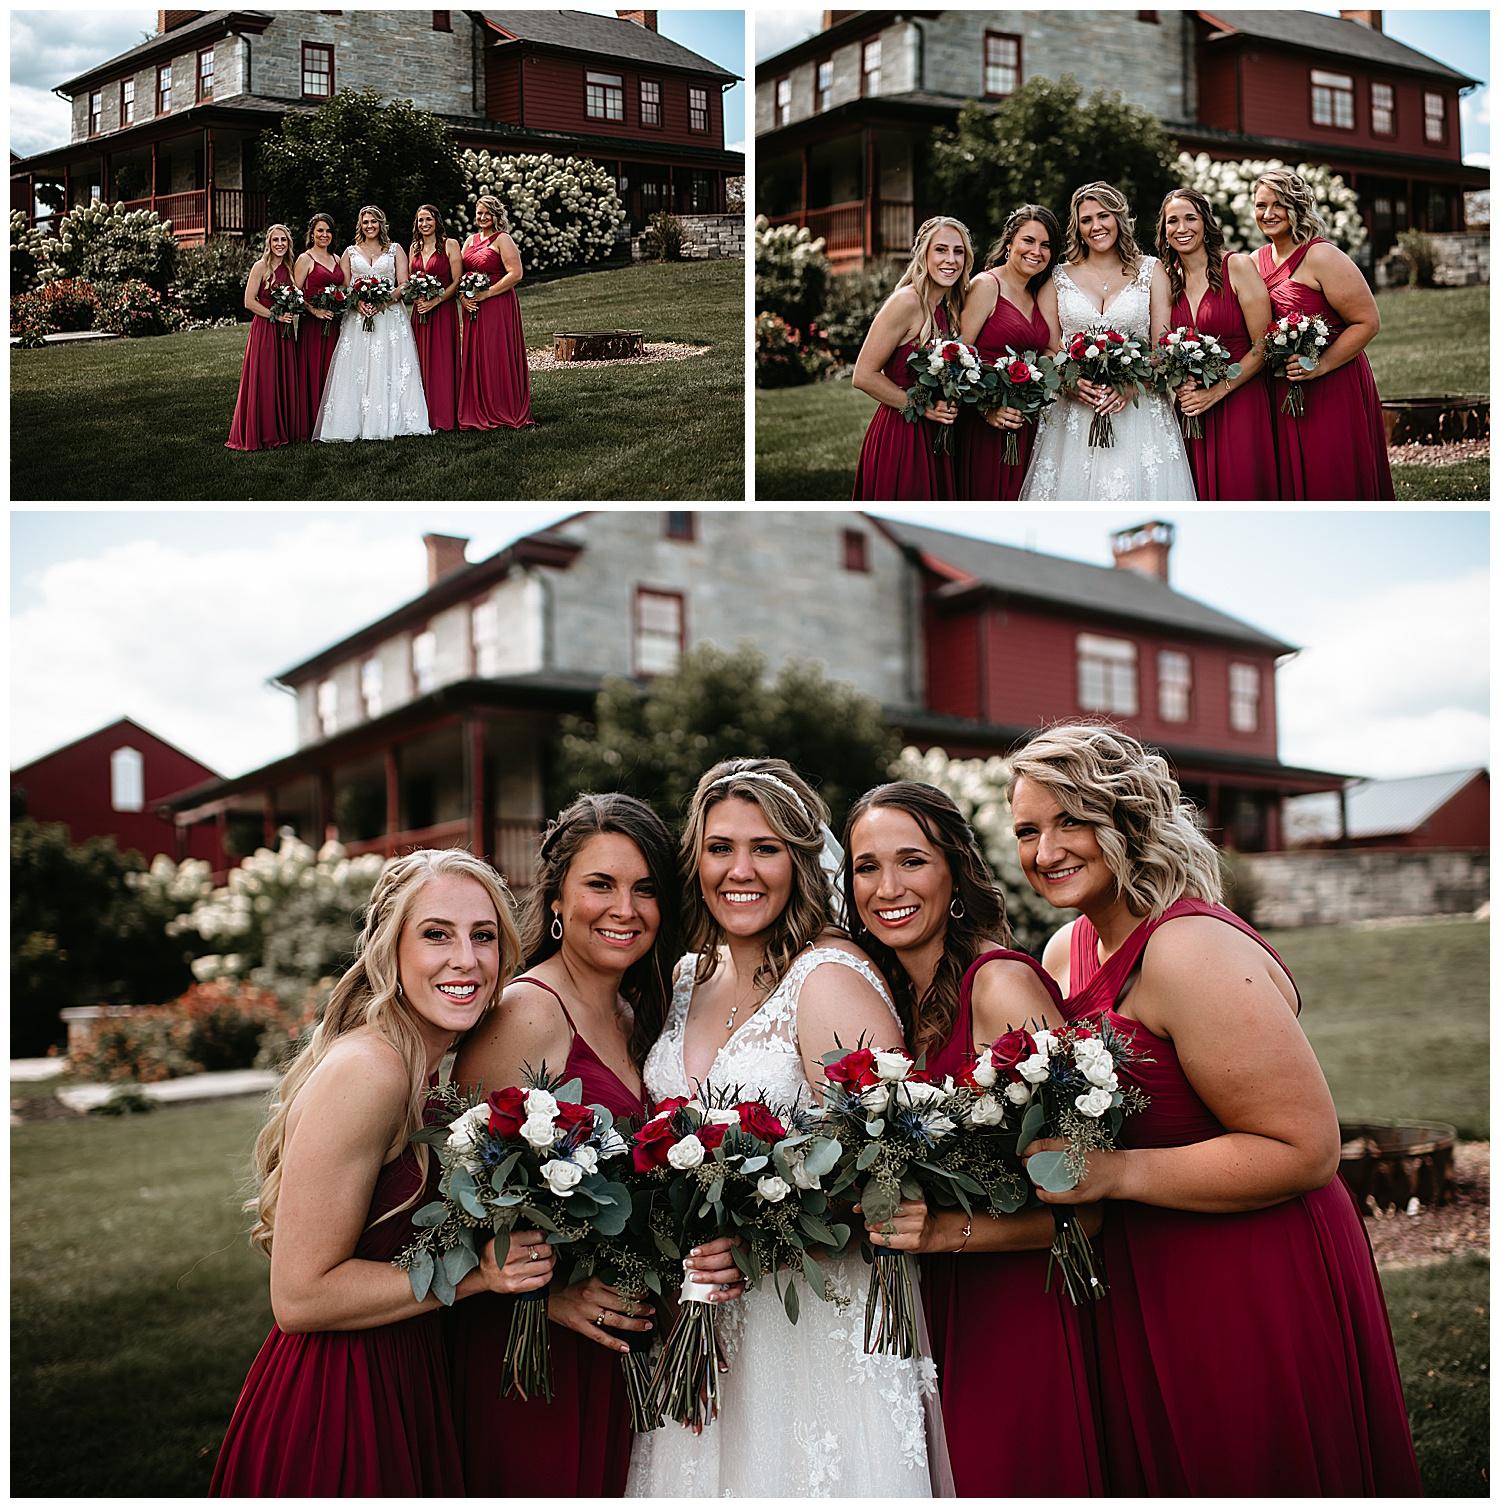 NEPA-Bloomgsburg-Wedding-Photographer-at-The-Barn-at-Greystone-Farms-Watsontown-PA_0045.jpg